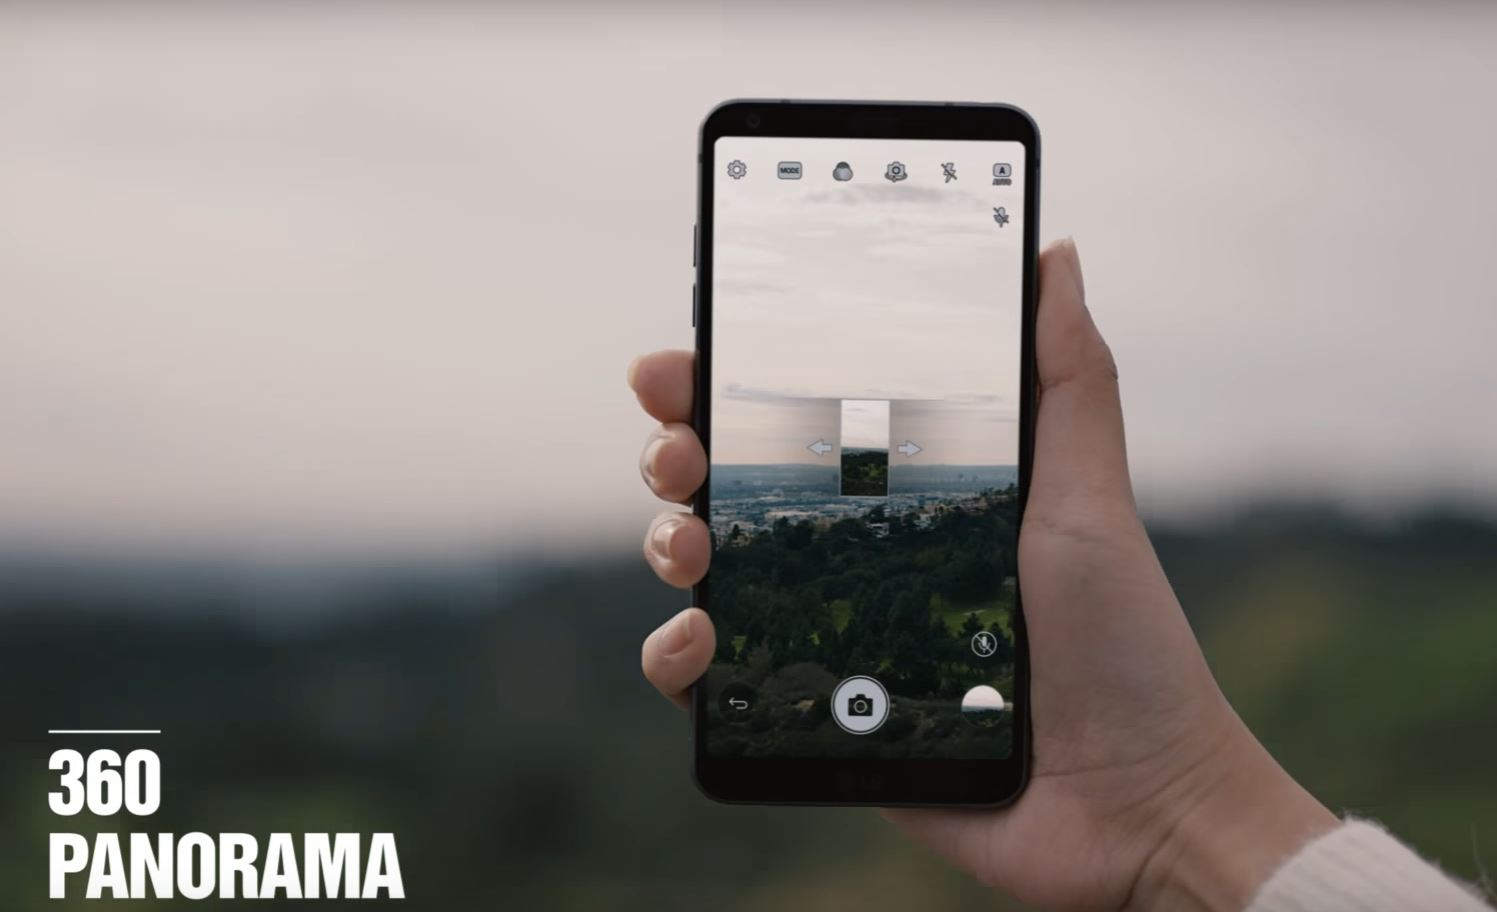 6 Reasons LG G6 Could Overshadow Samsung Galaxy S8